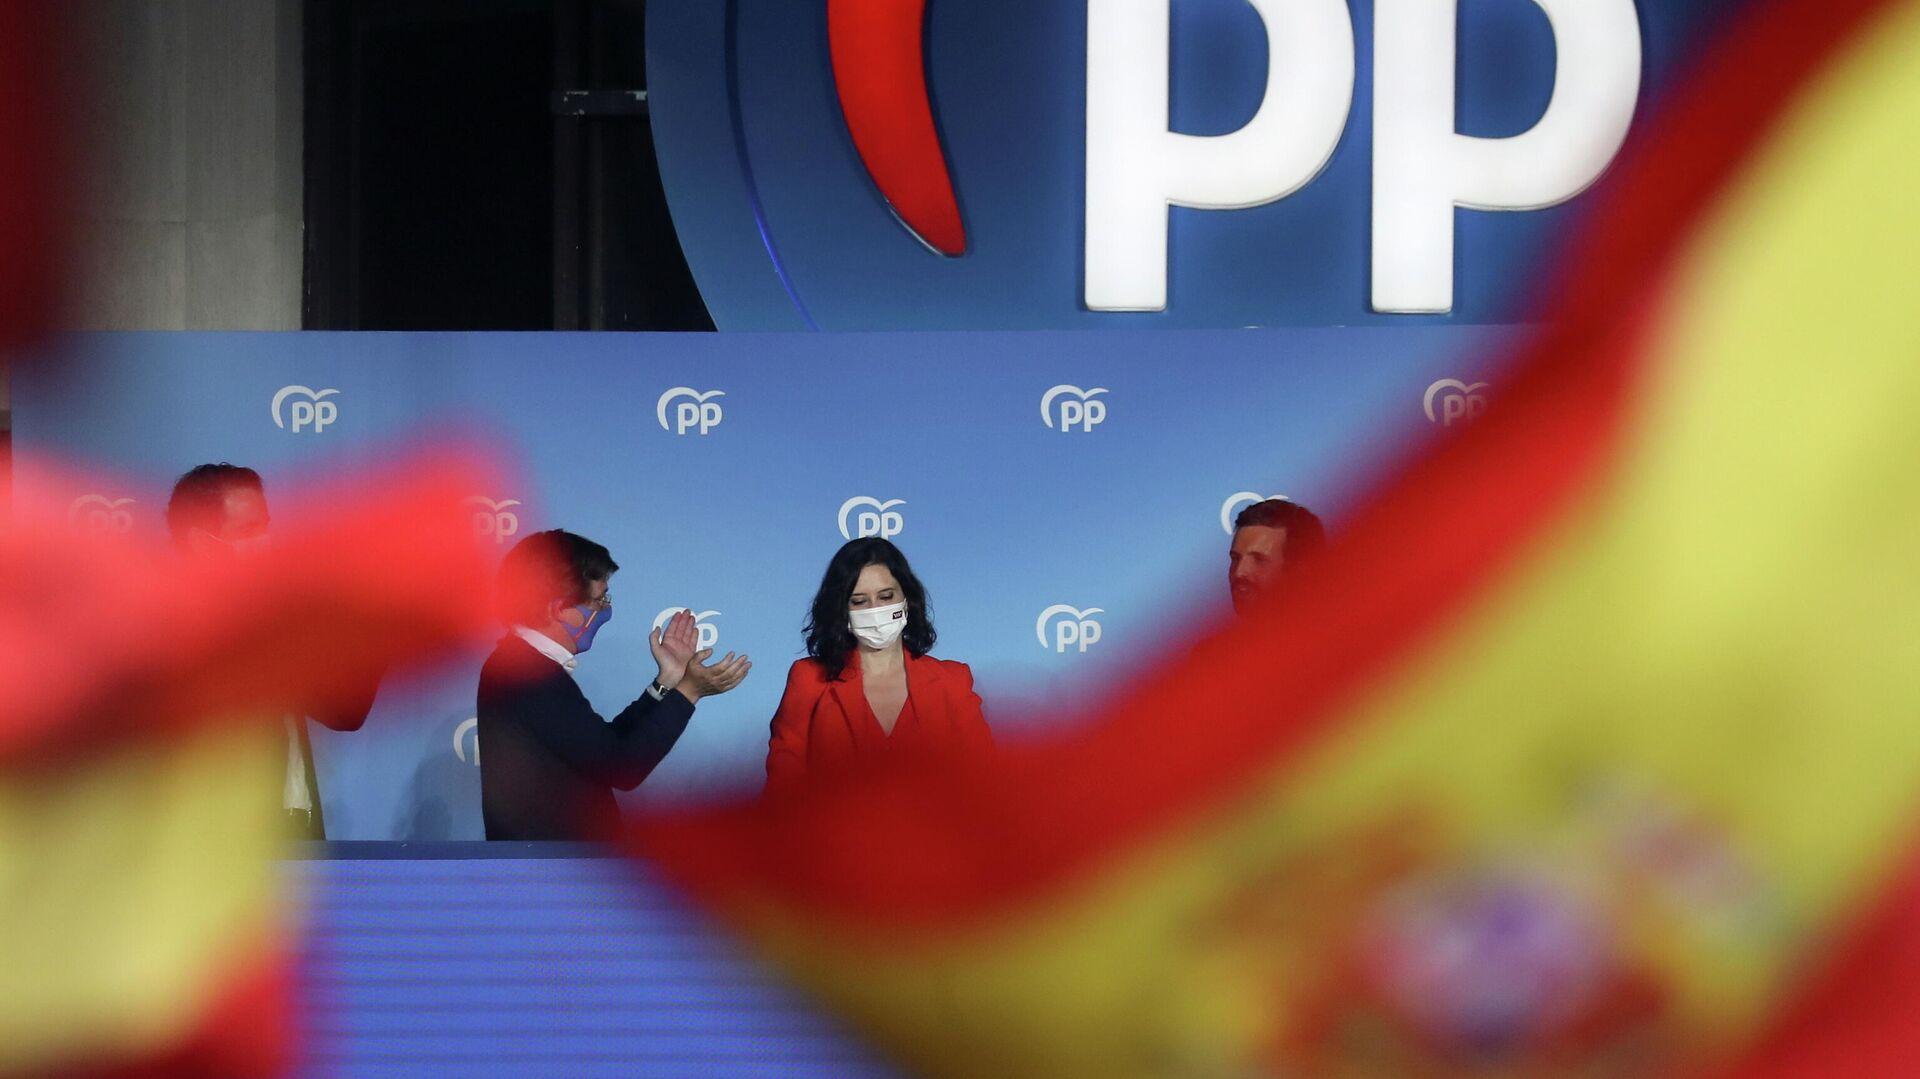 Elecciones regionales de Madrid - Sputnik Mundo, 1920, 05.05.2021